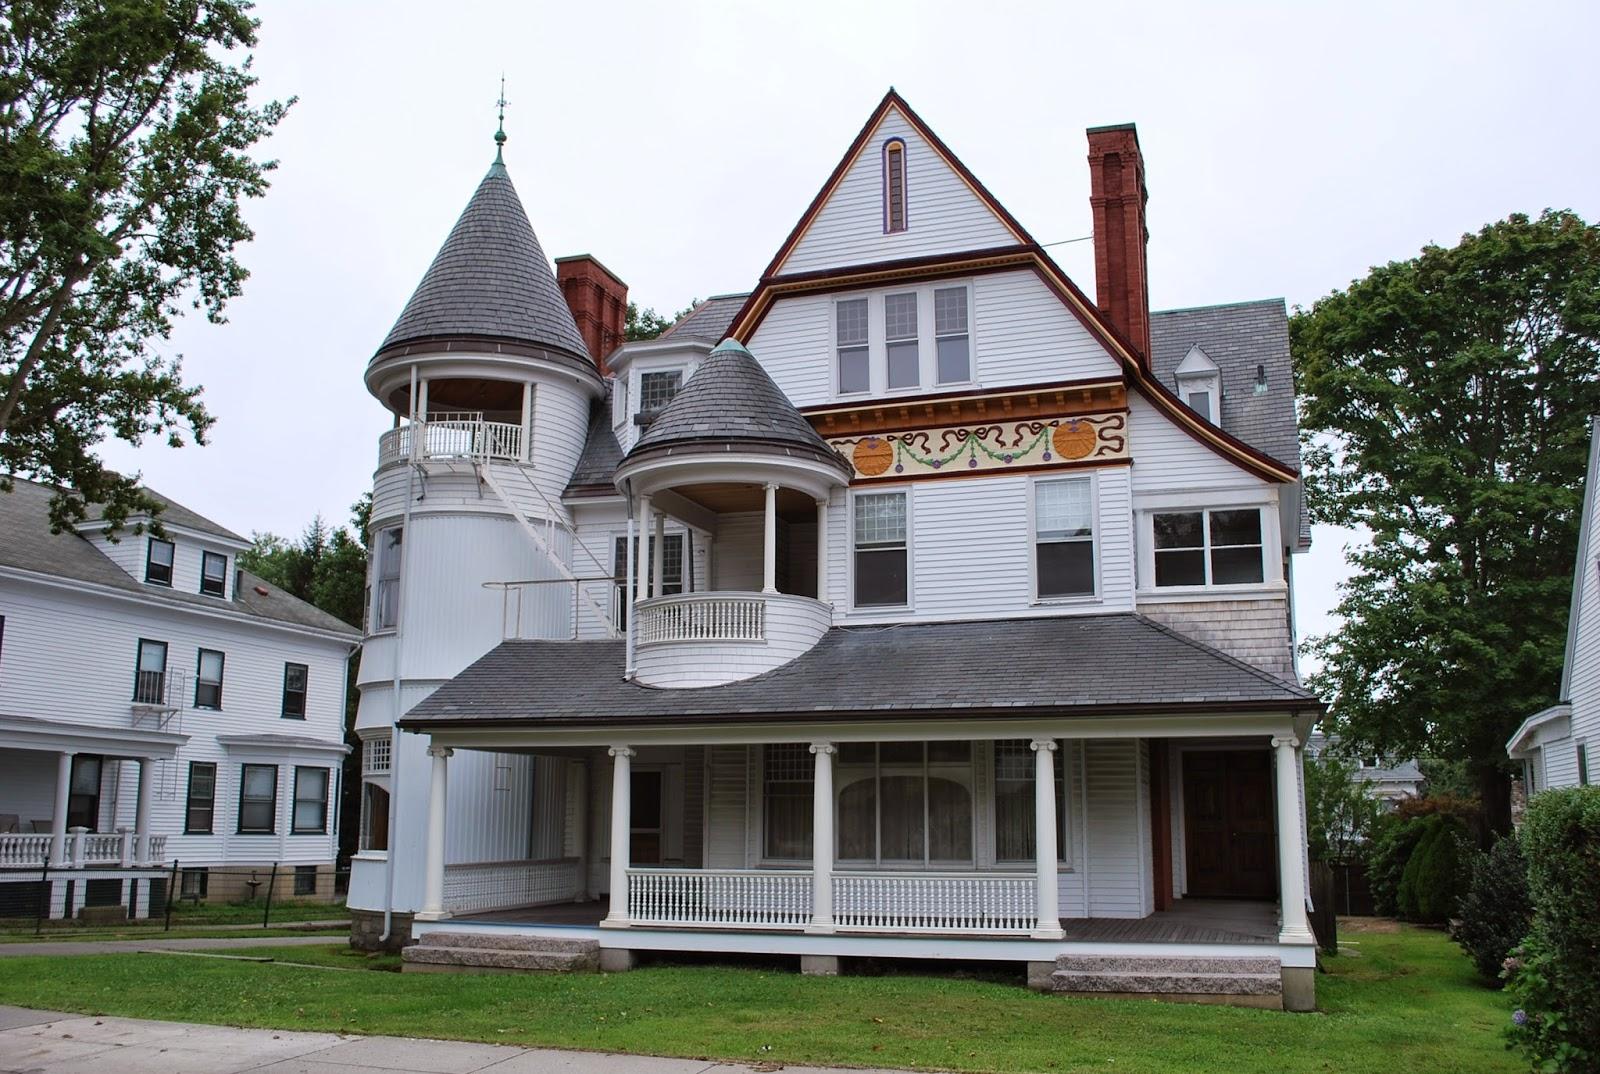 Maison Newport